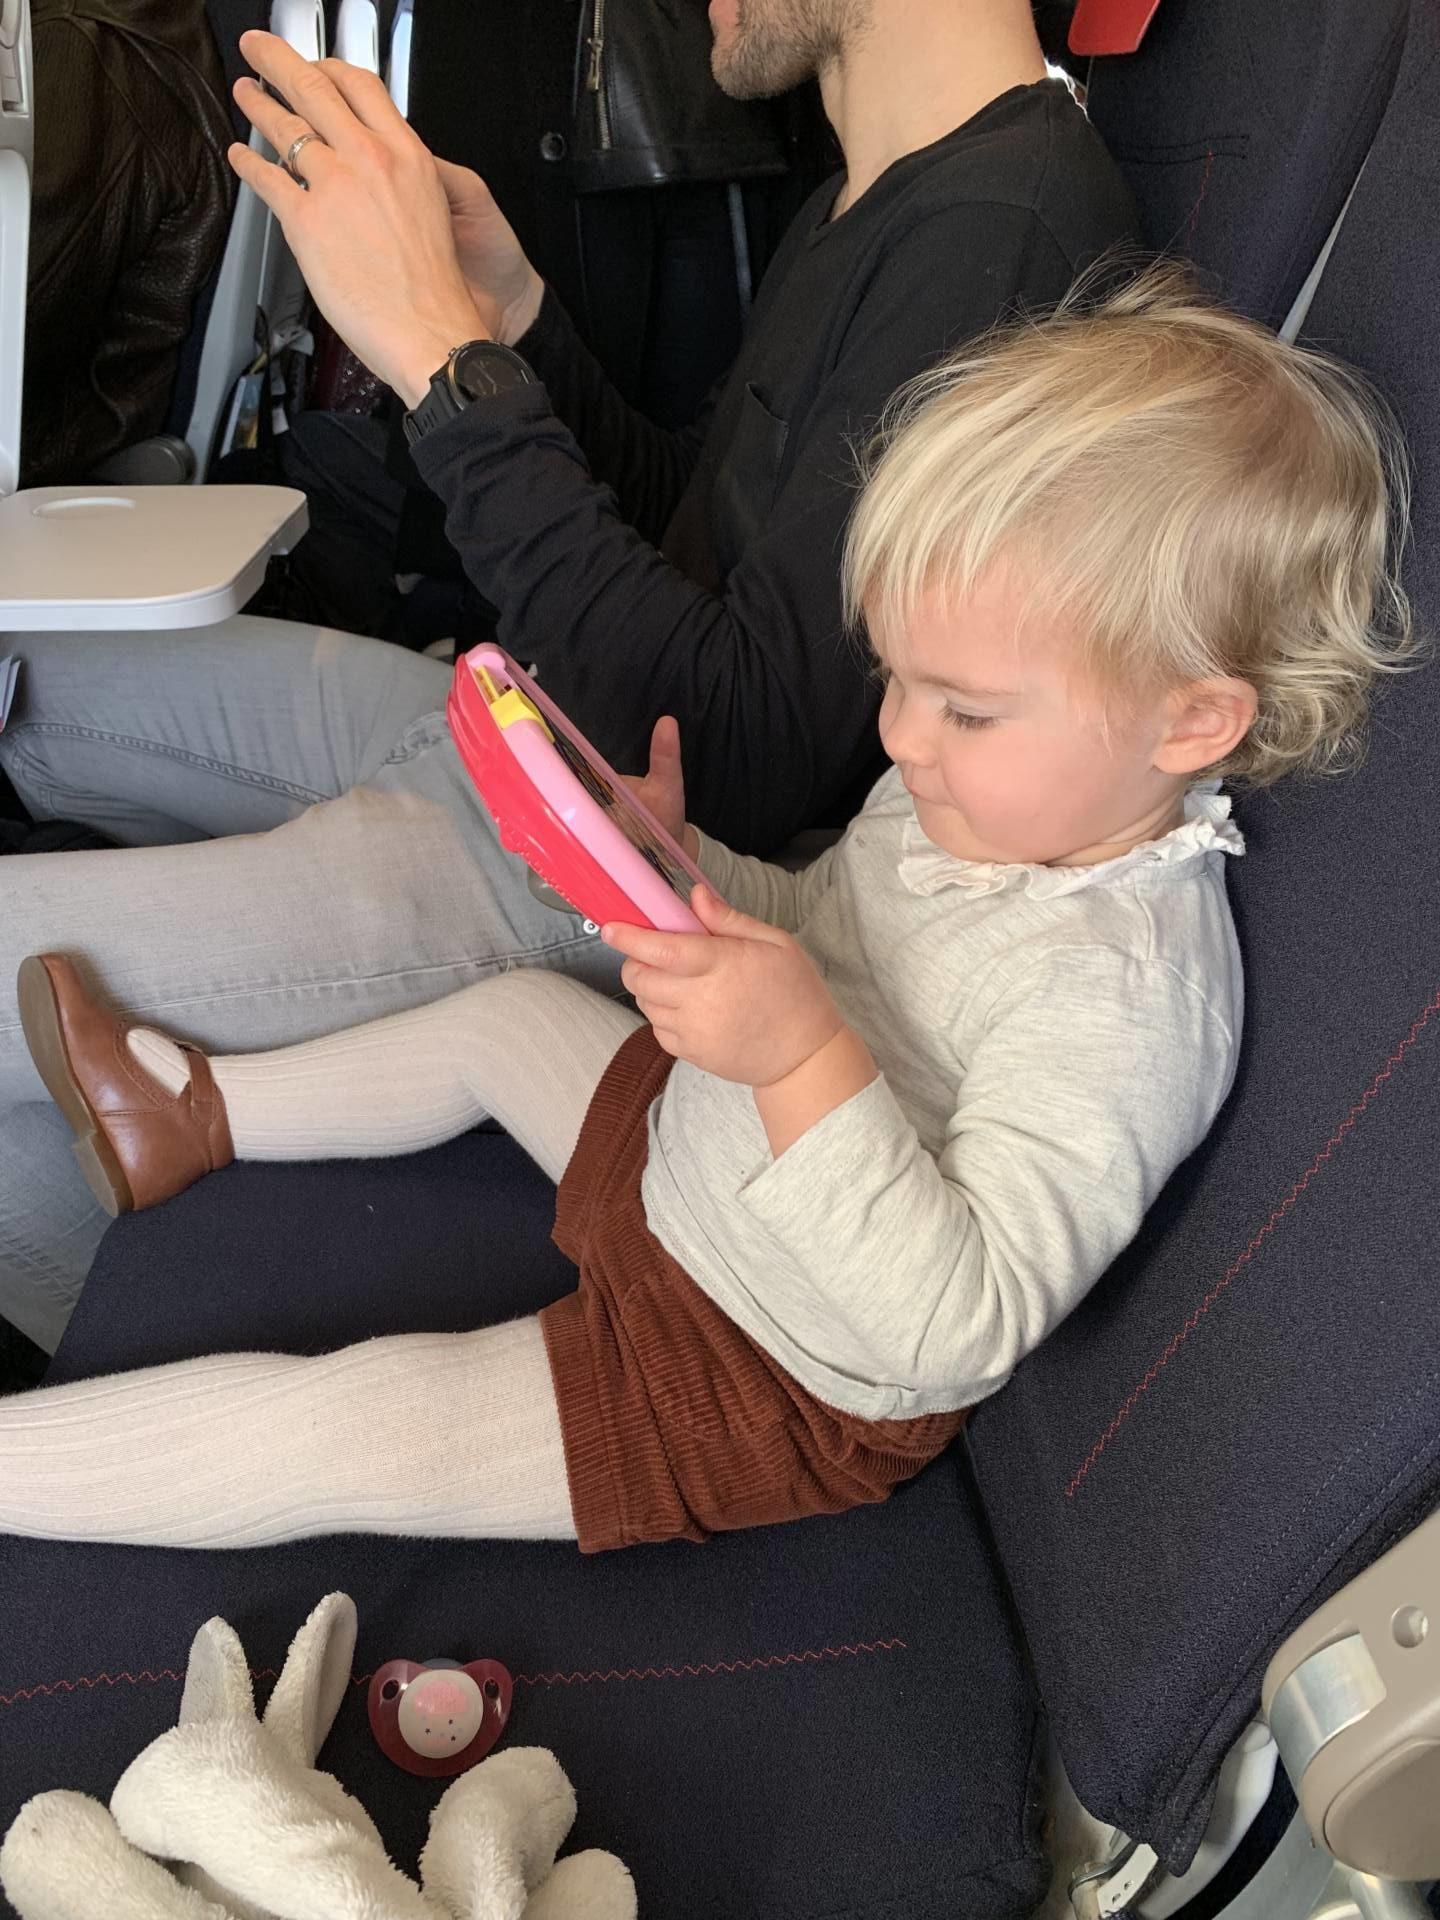 voyage-bébé-avion